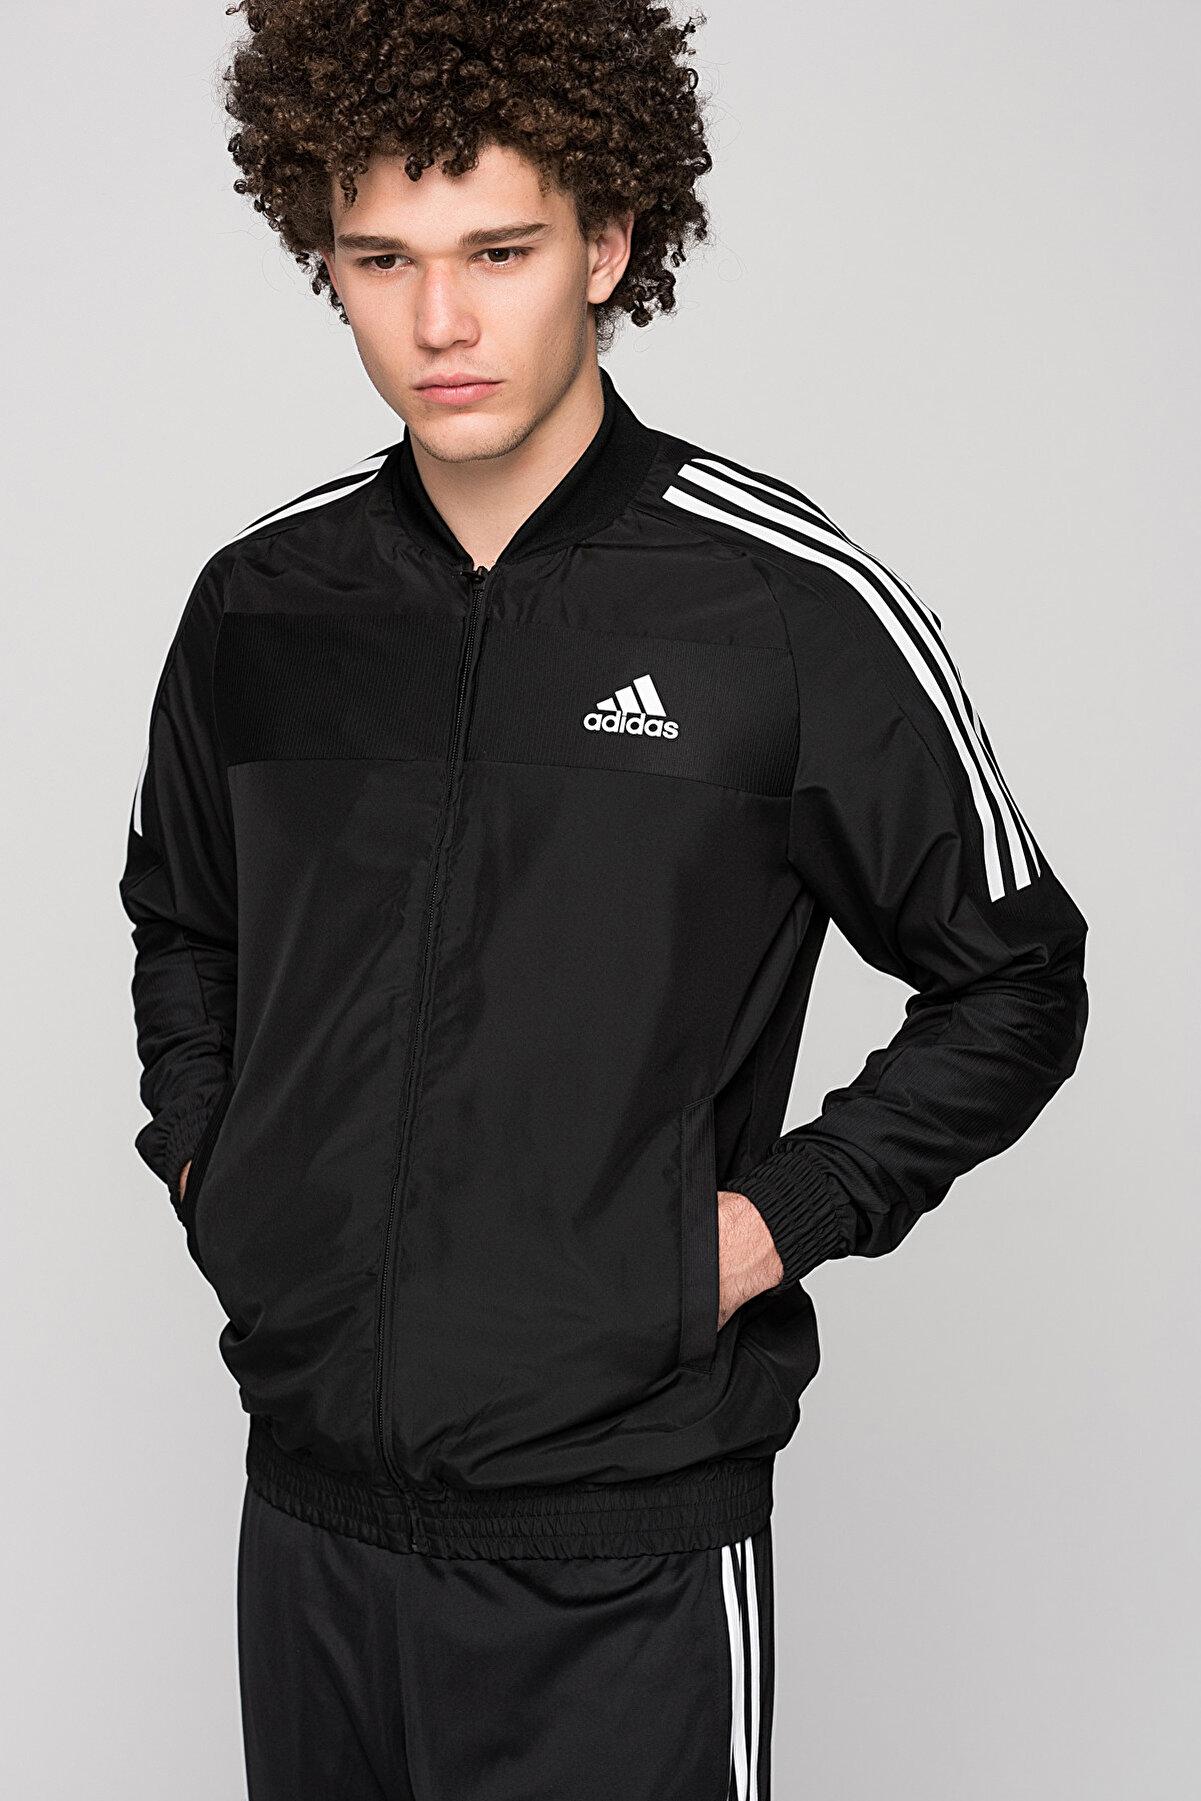 adidas Erkek Sweatshirt - Club Jacket - B45845